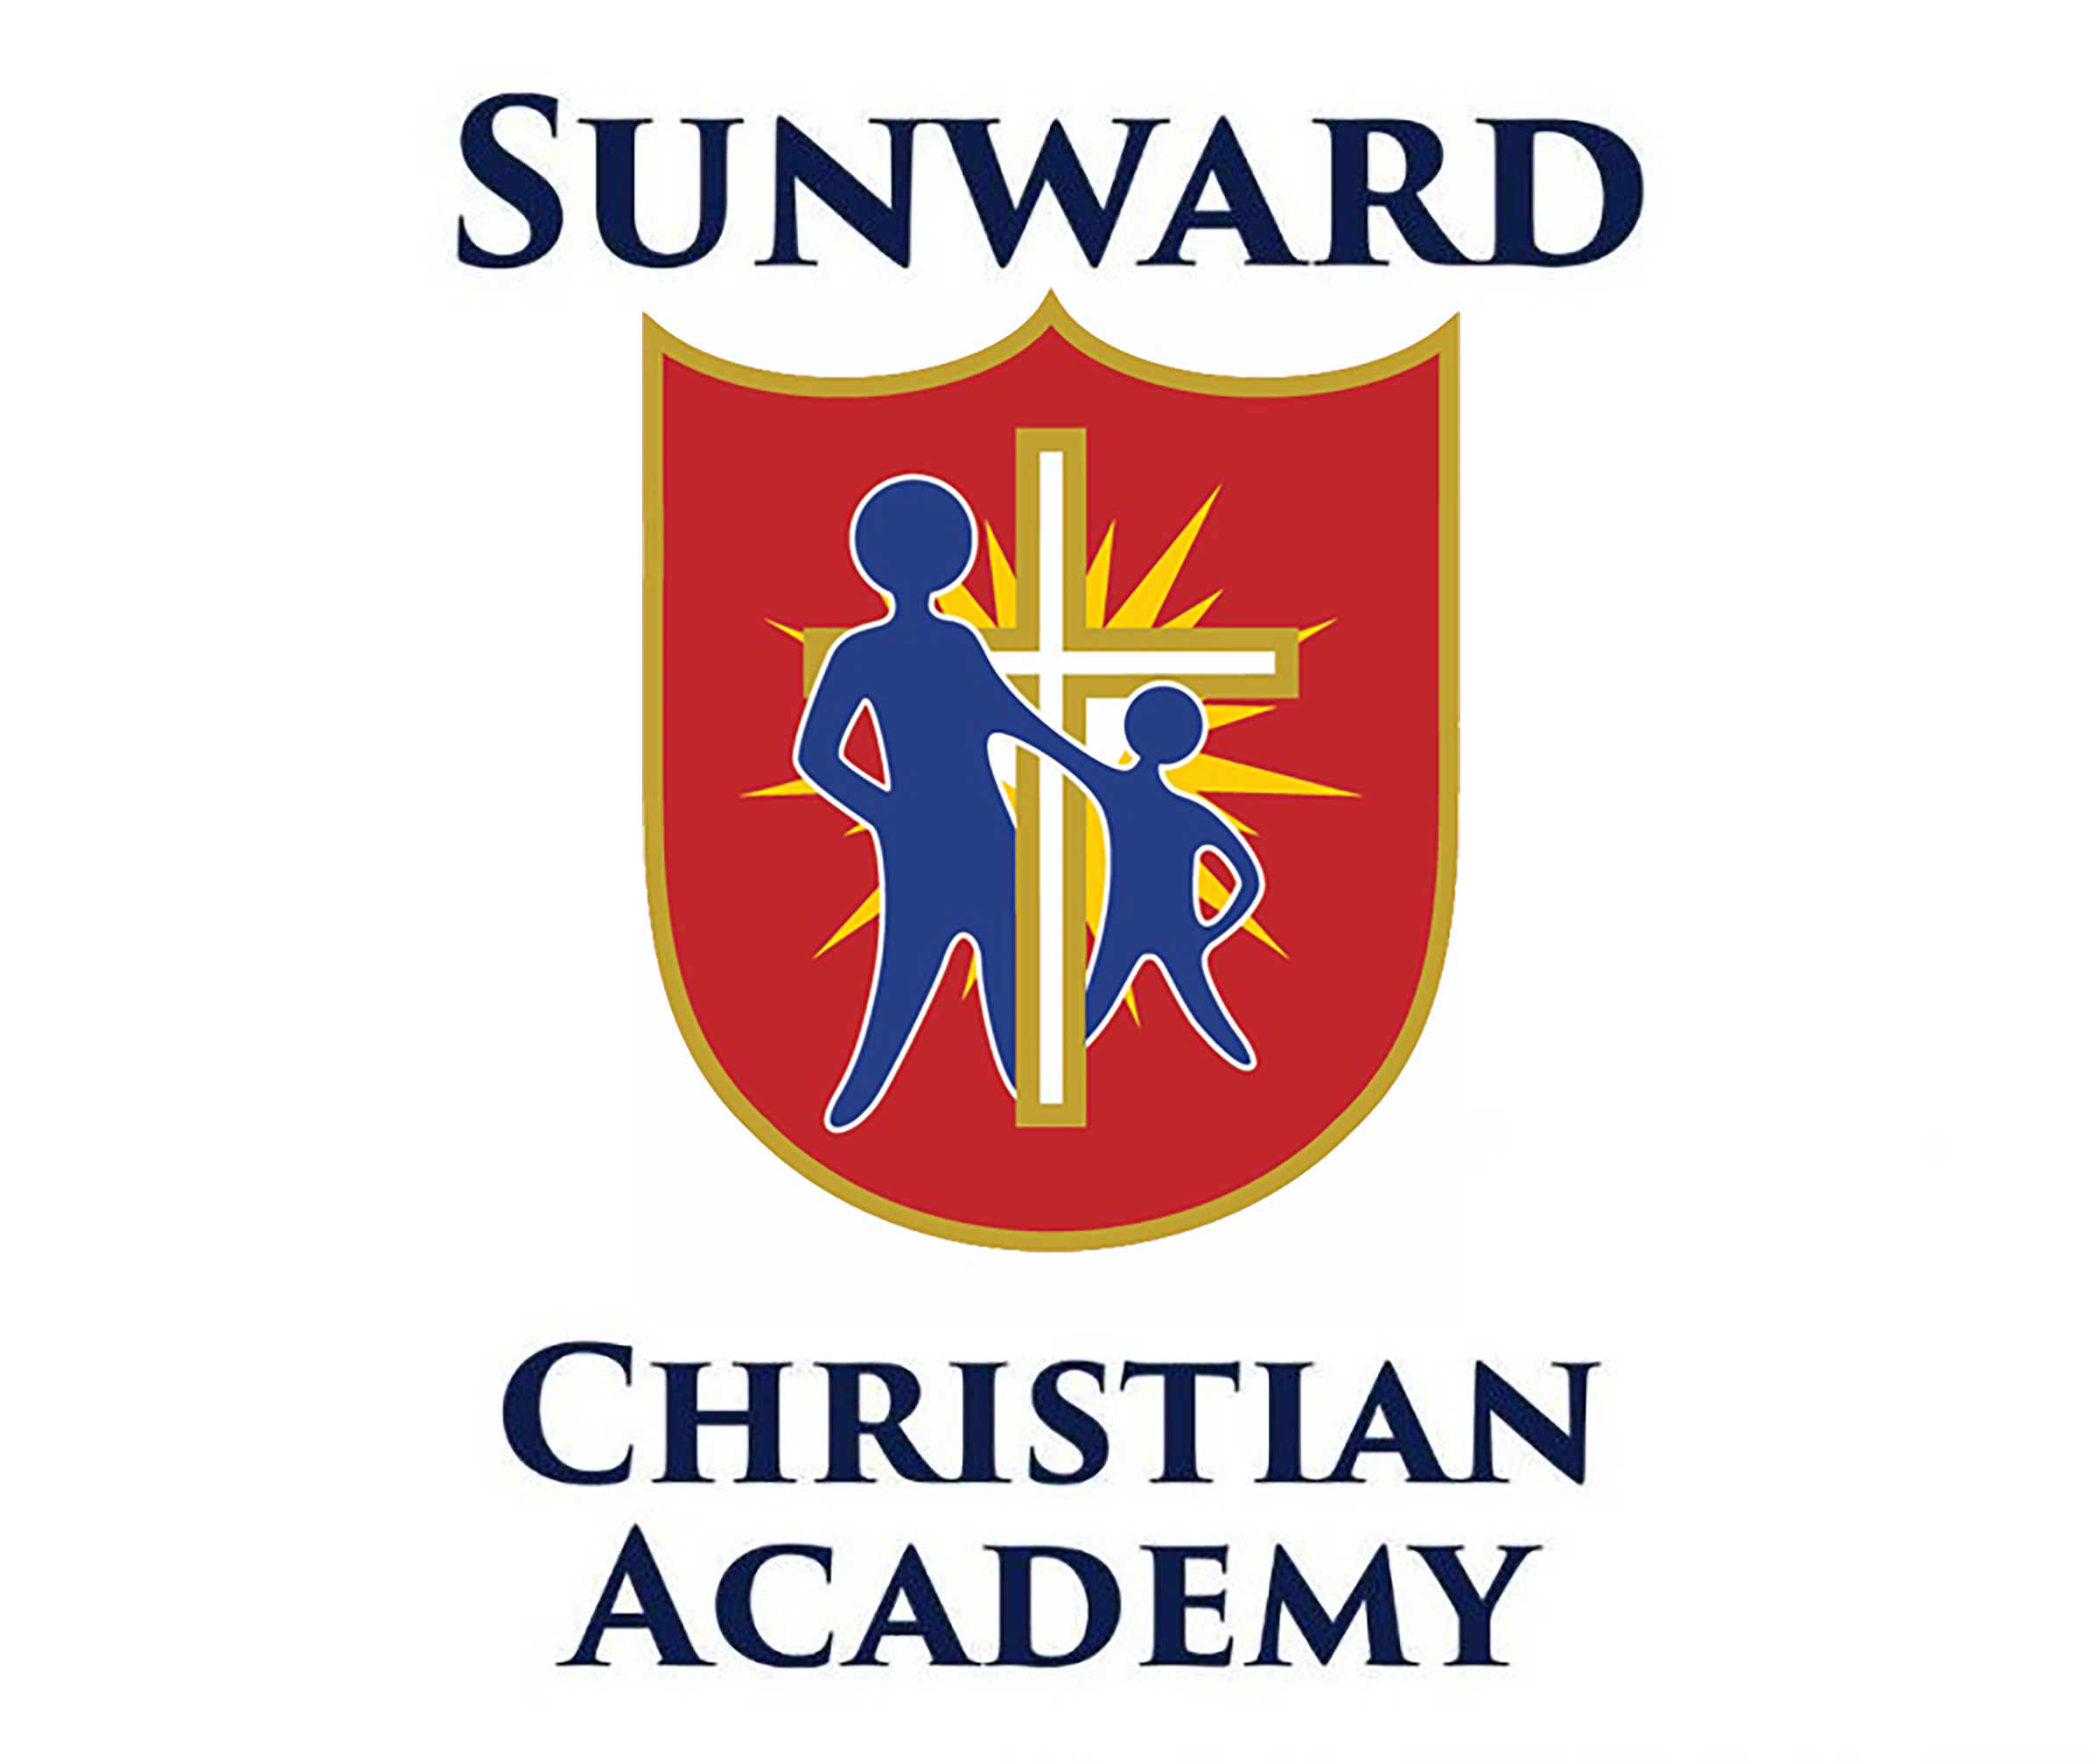 Sunward Park logo copy